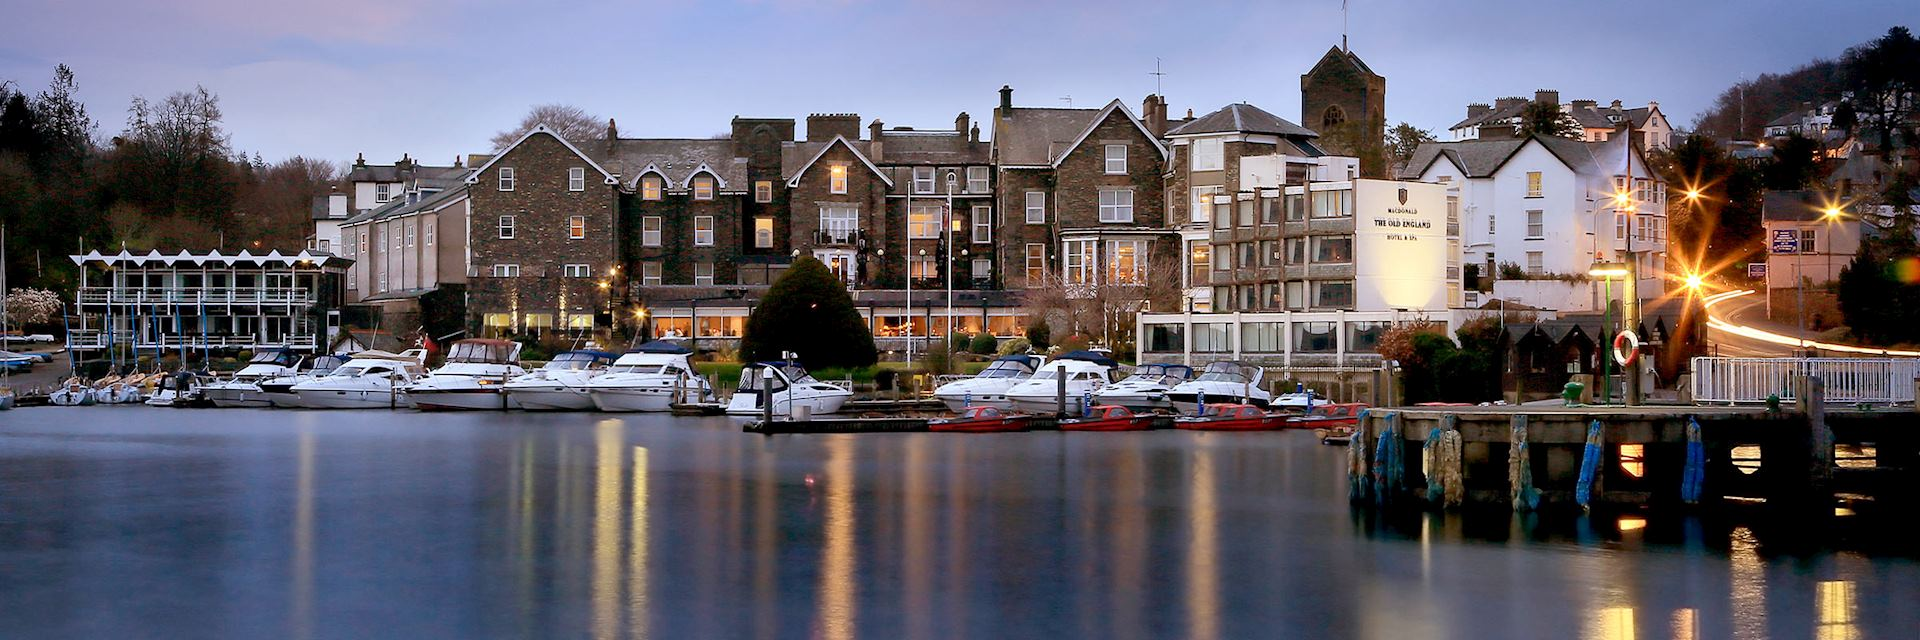 Macdonald Old England Hotel & Spa, the Lake District